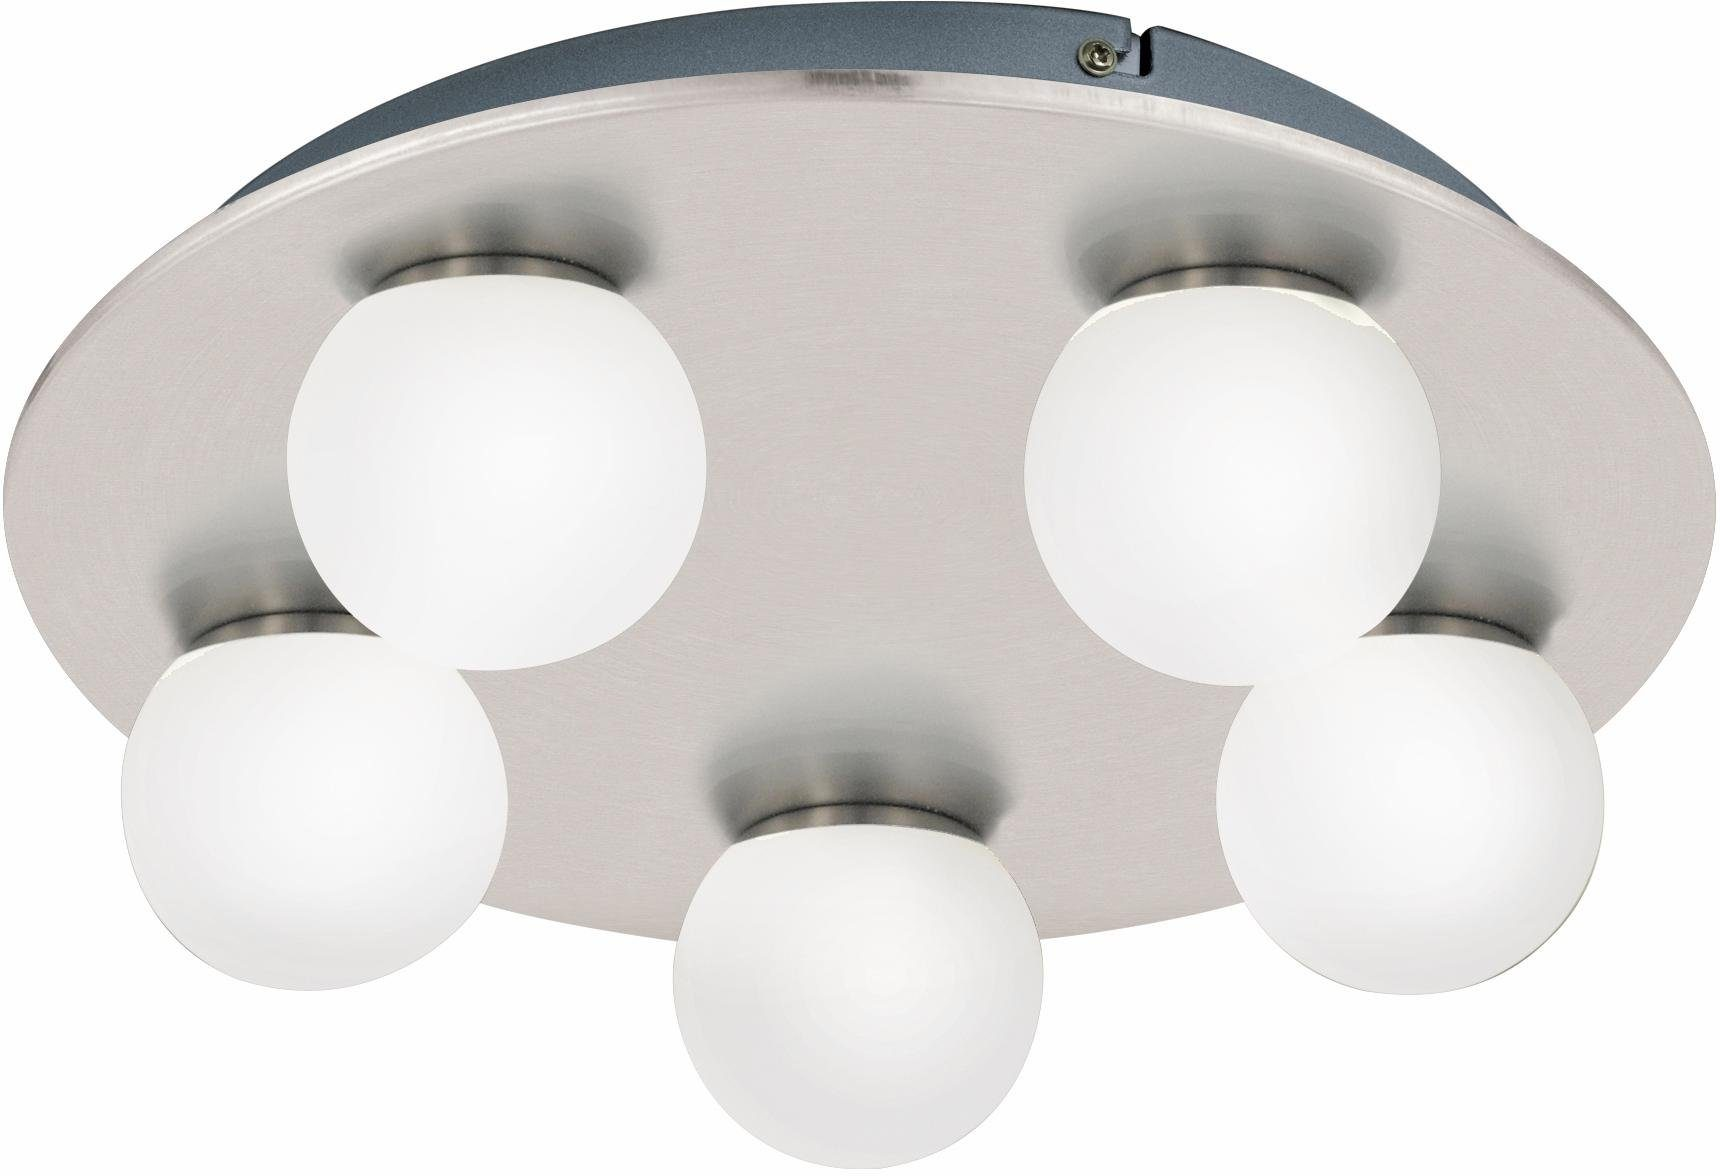 Eglo LED Wand- Deckenleuchte, Badleuchte, 5flg., Ø 35 cm, »MOSIANO«